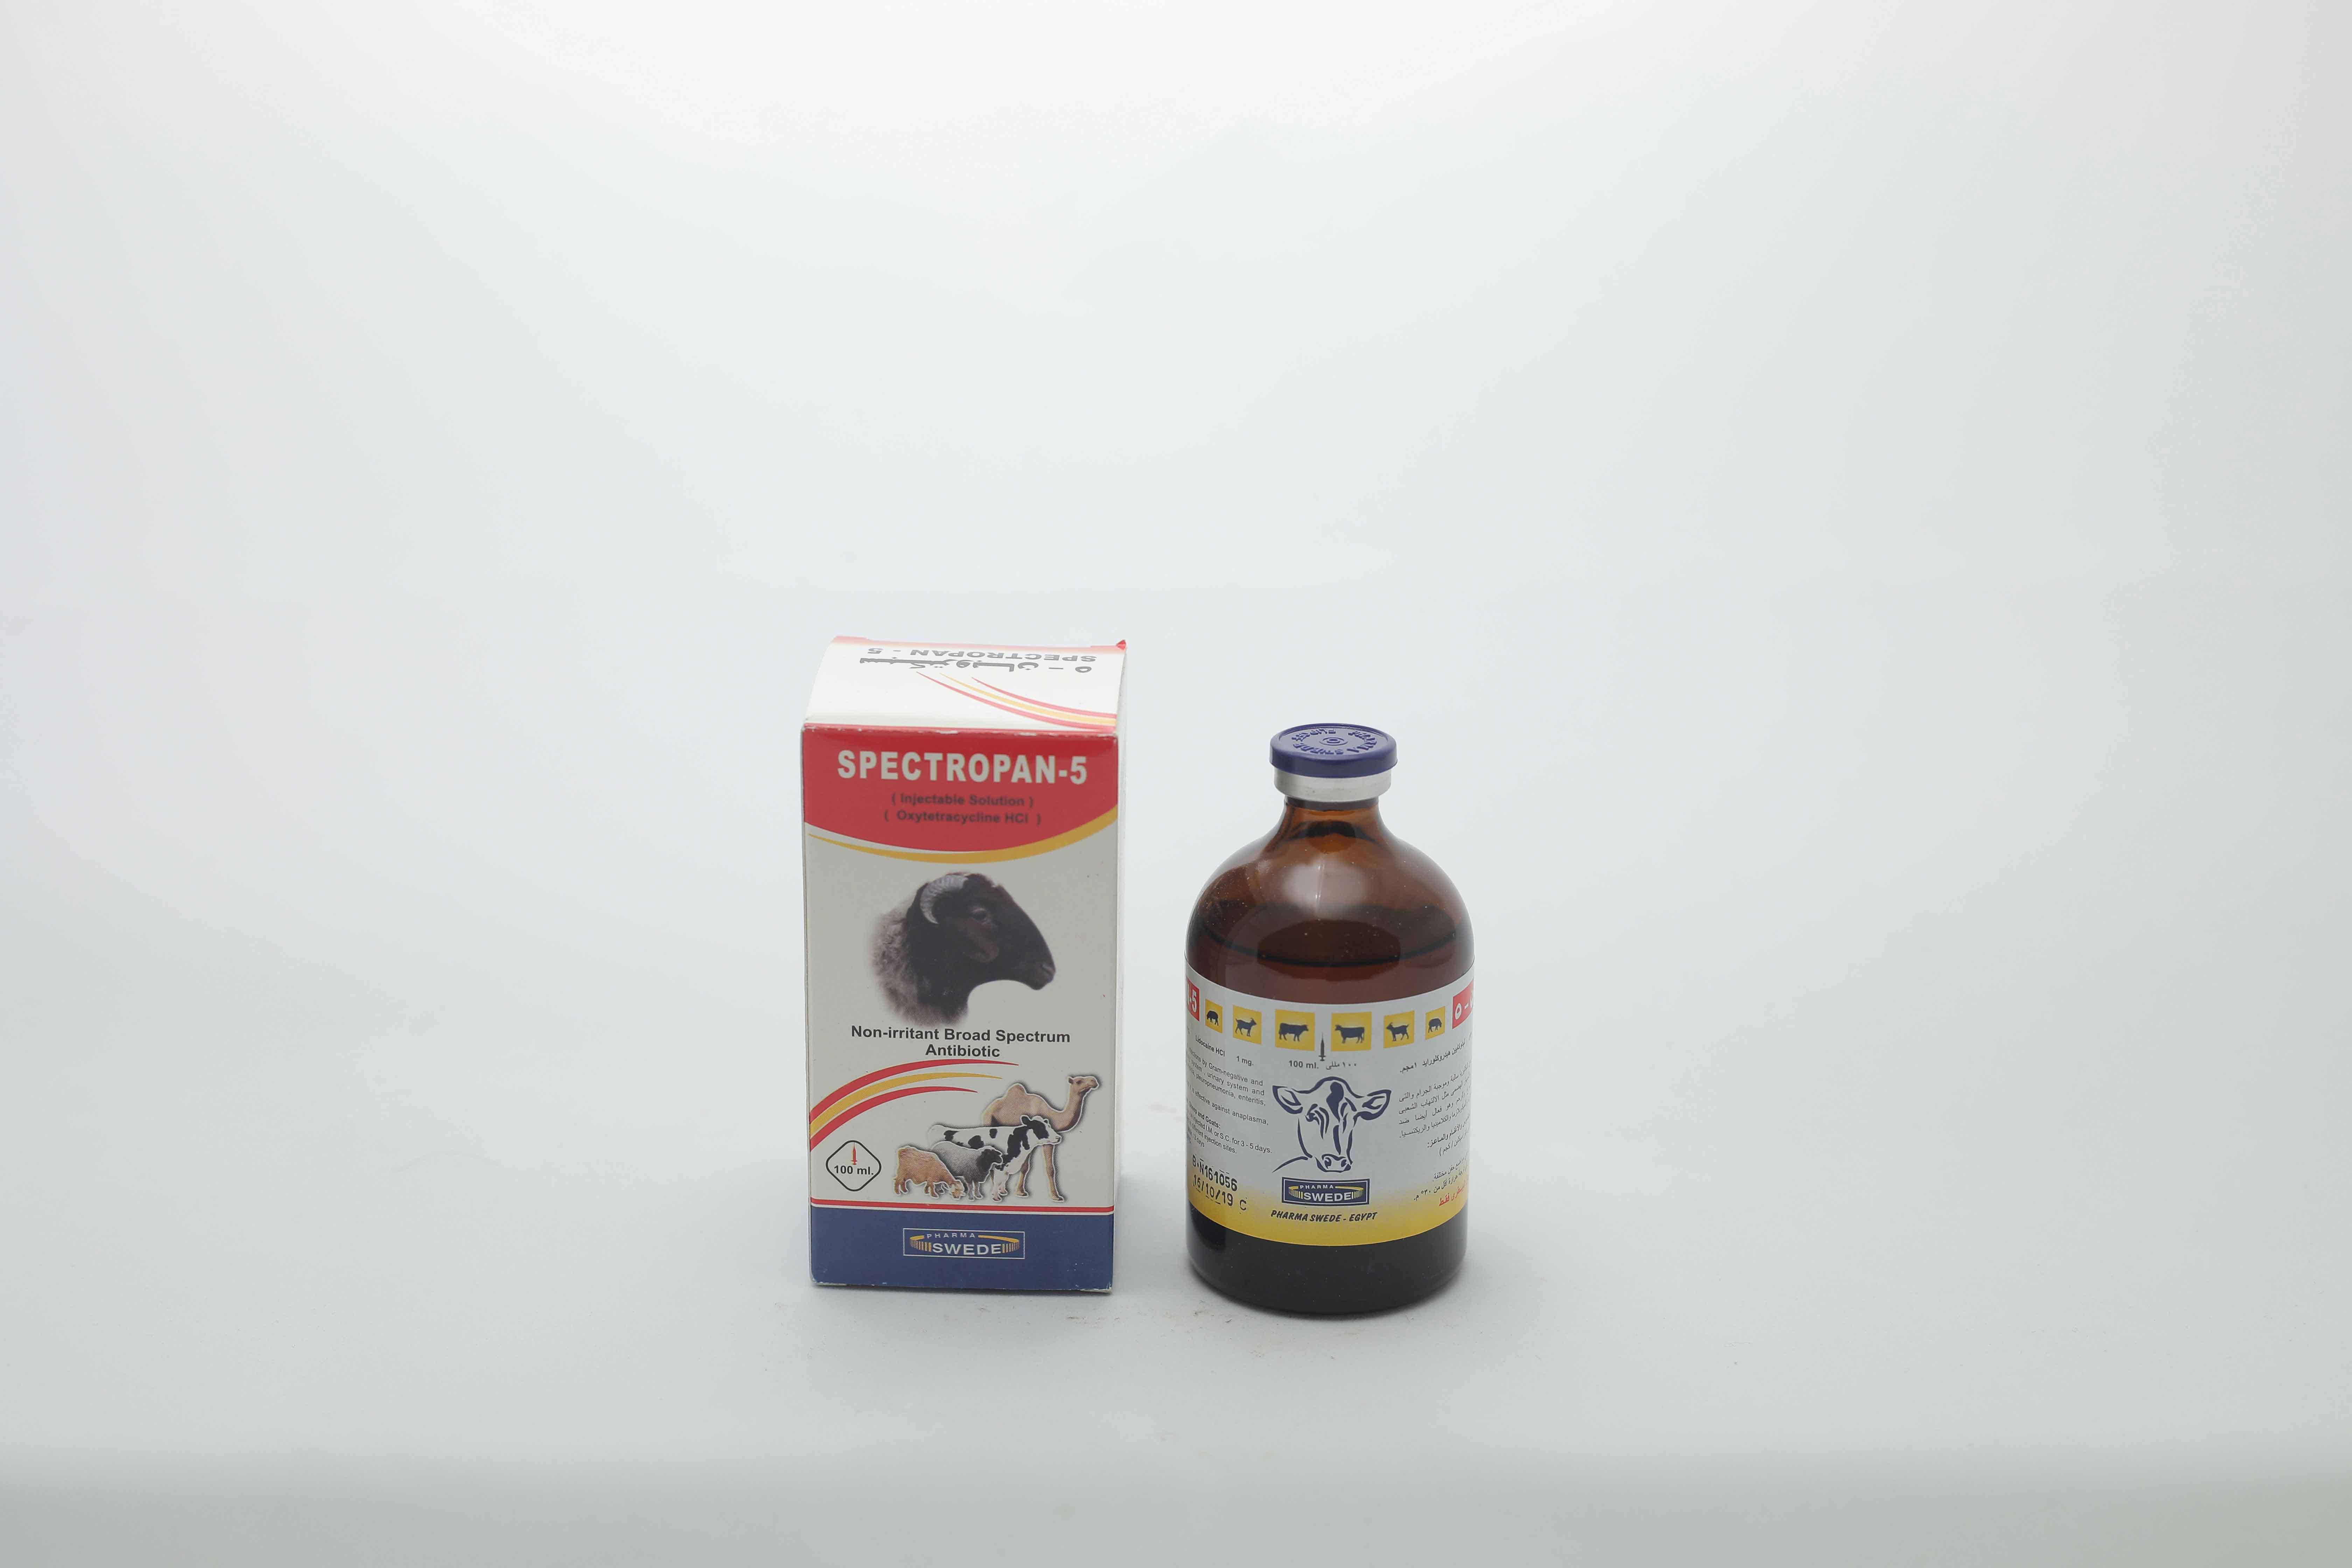 Oxyvet-Pharma 5% (Spectropan-5) injection